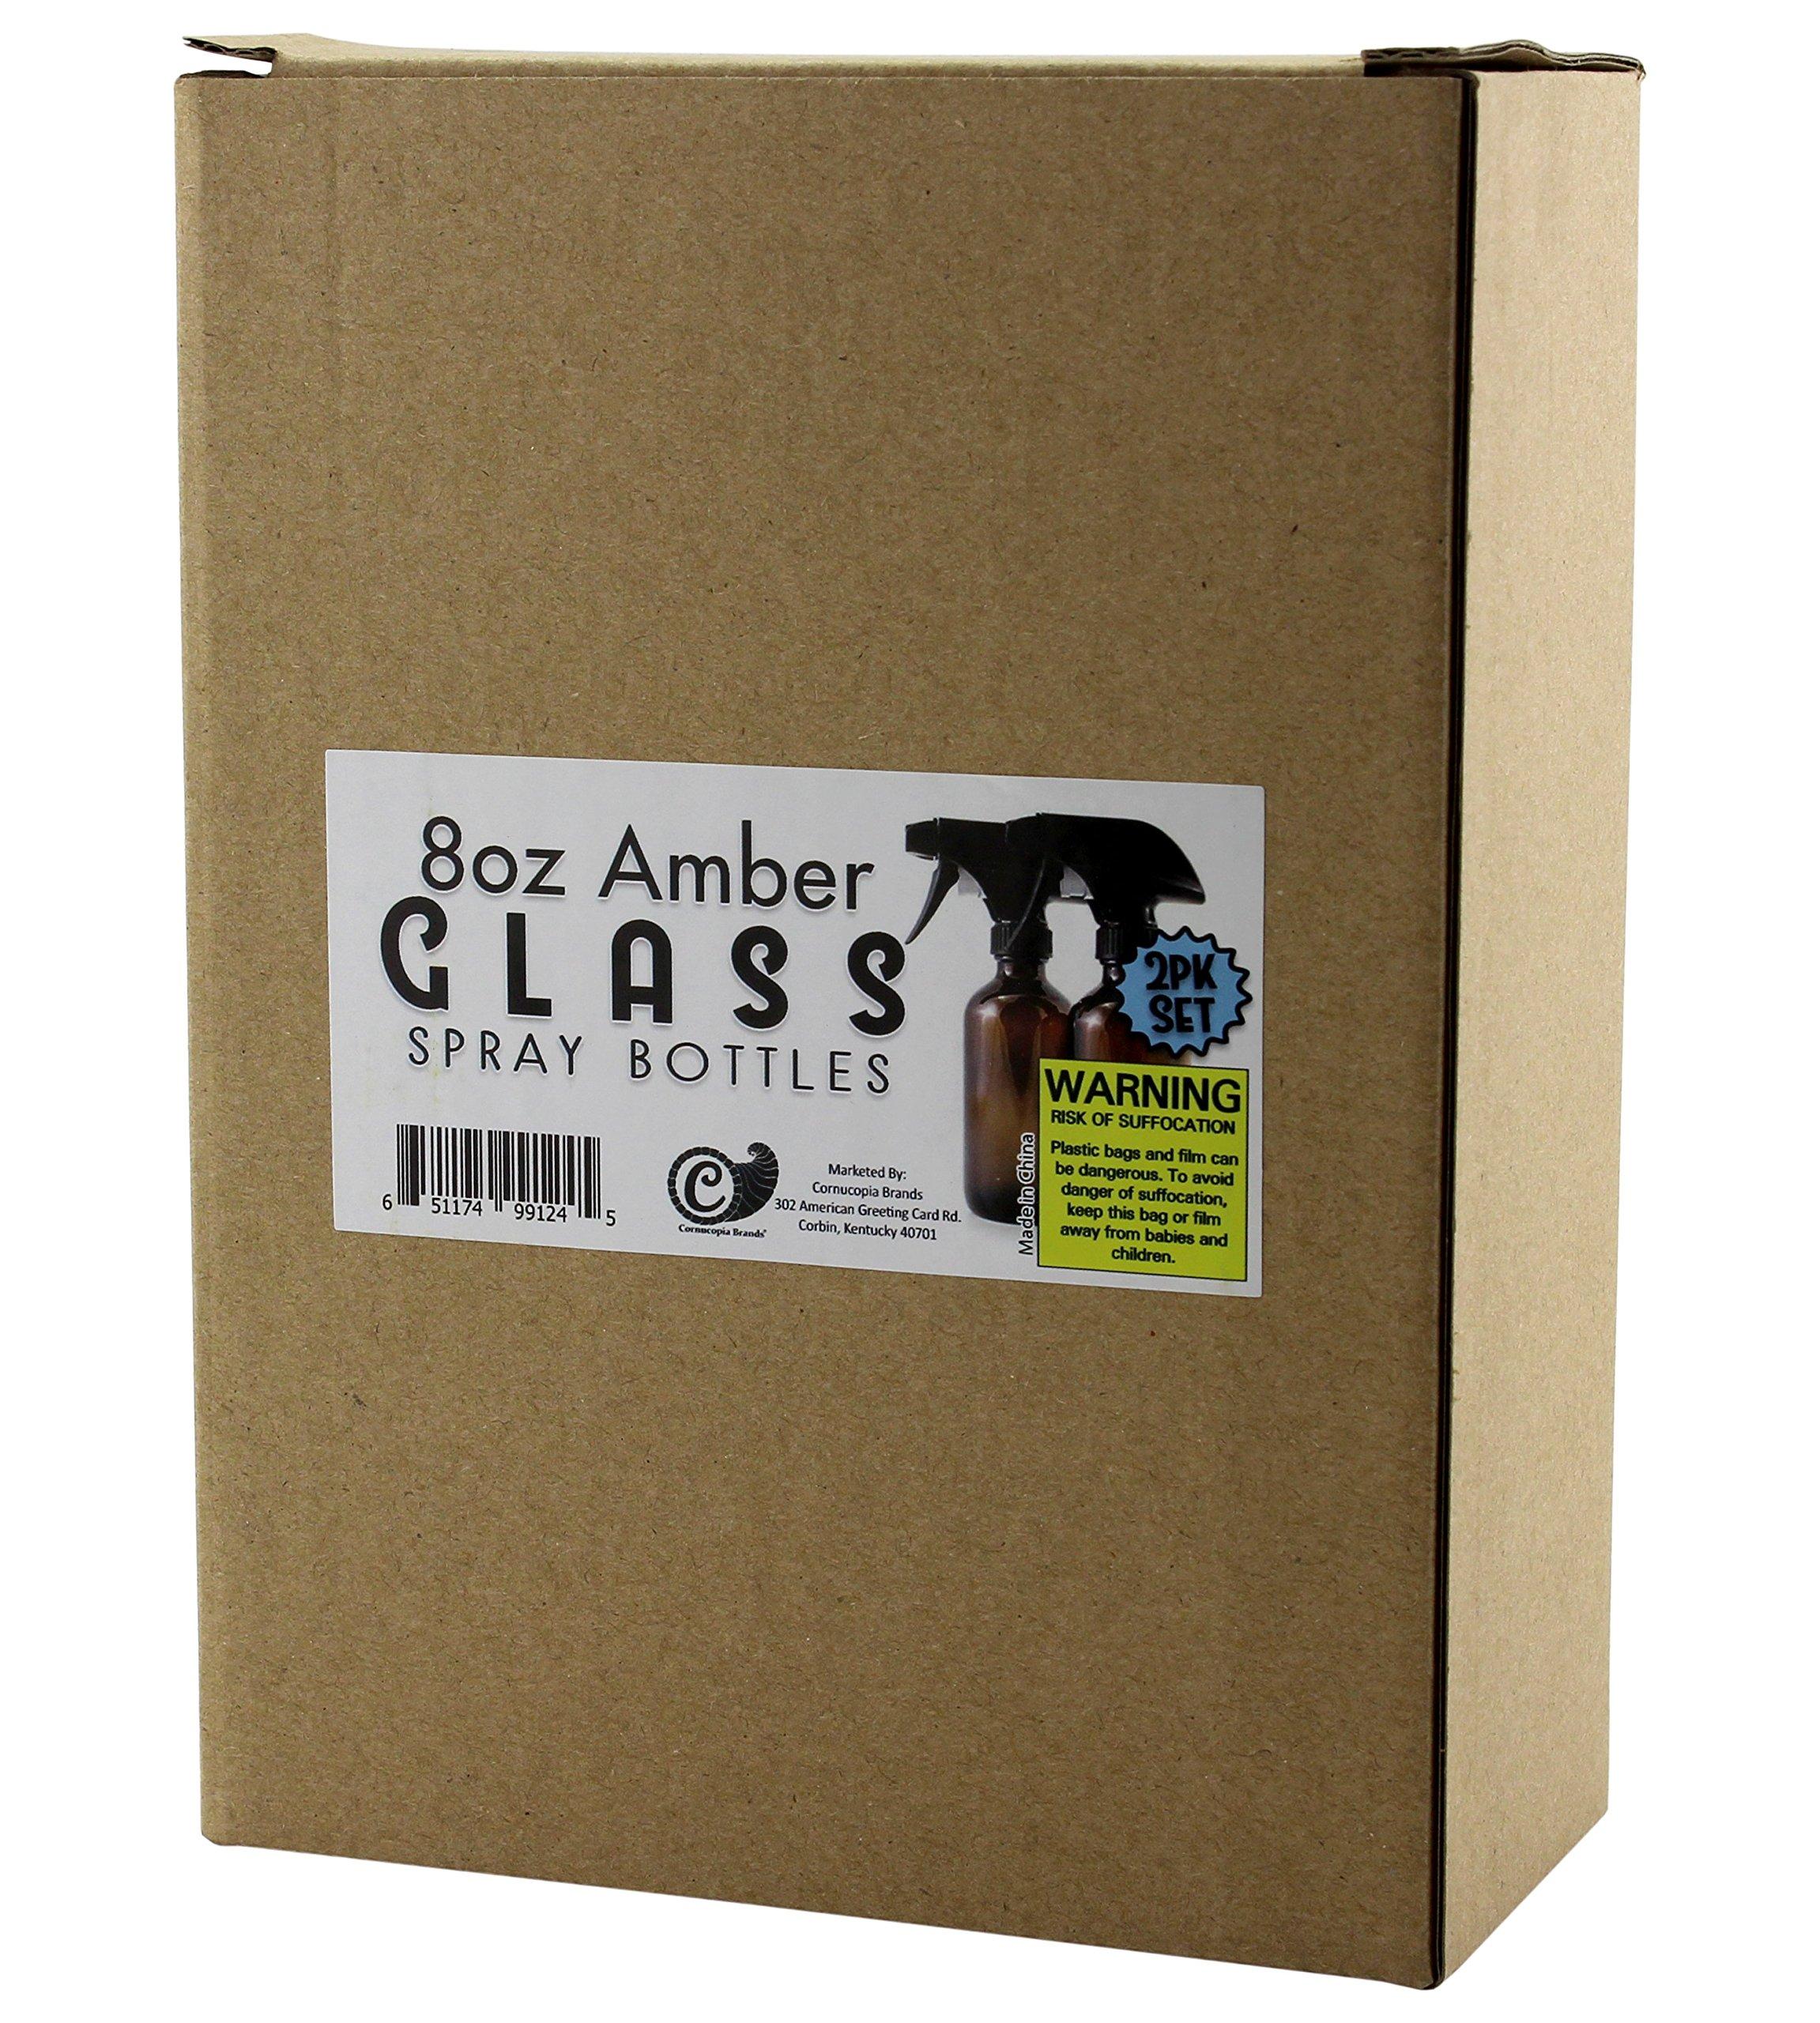 8oz Amber Glass Boston Round Spray Bottles (2 Pack); w/ Heavy Duty Mist & Stream Sprayers Perfect for Essential Oil Blends by Cornucopia Brands (Image #8)